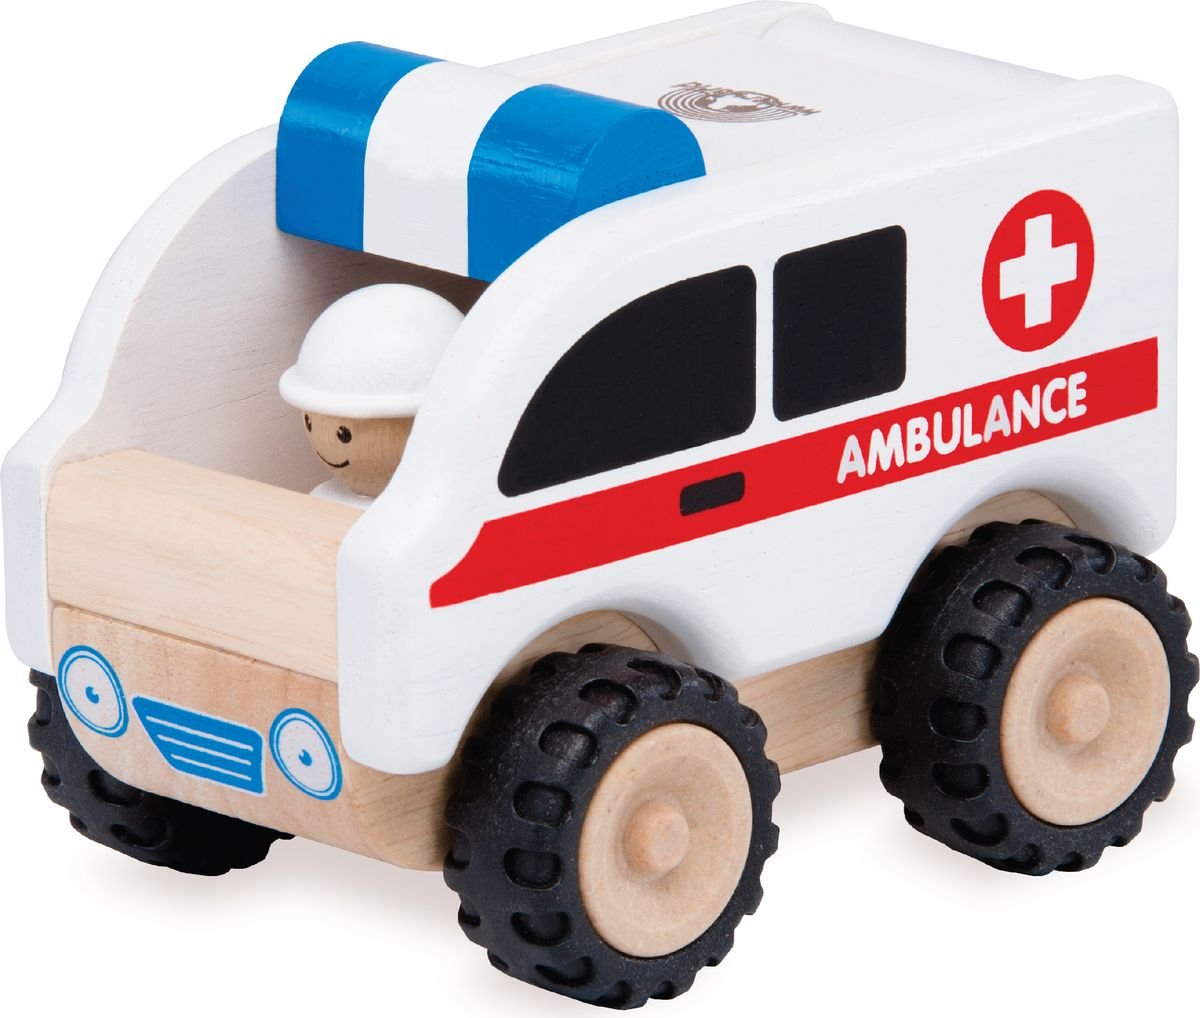 Wonderworld Деревянная игрушка Скорая помощь Miniworld деревянные игрушки wonderworld пожарная машина miniworld